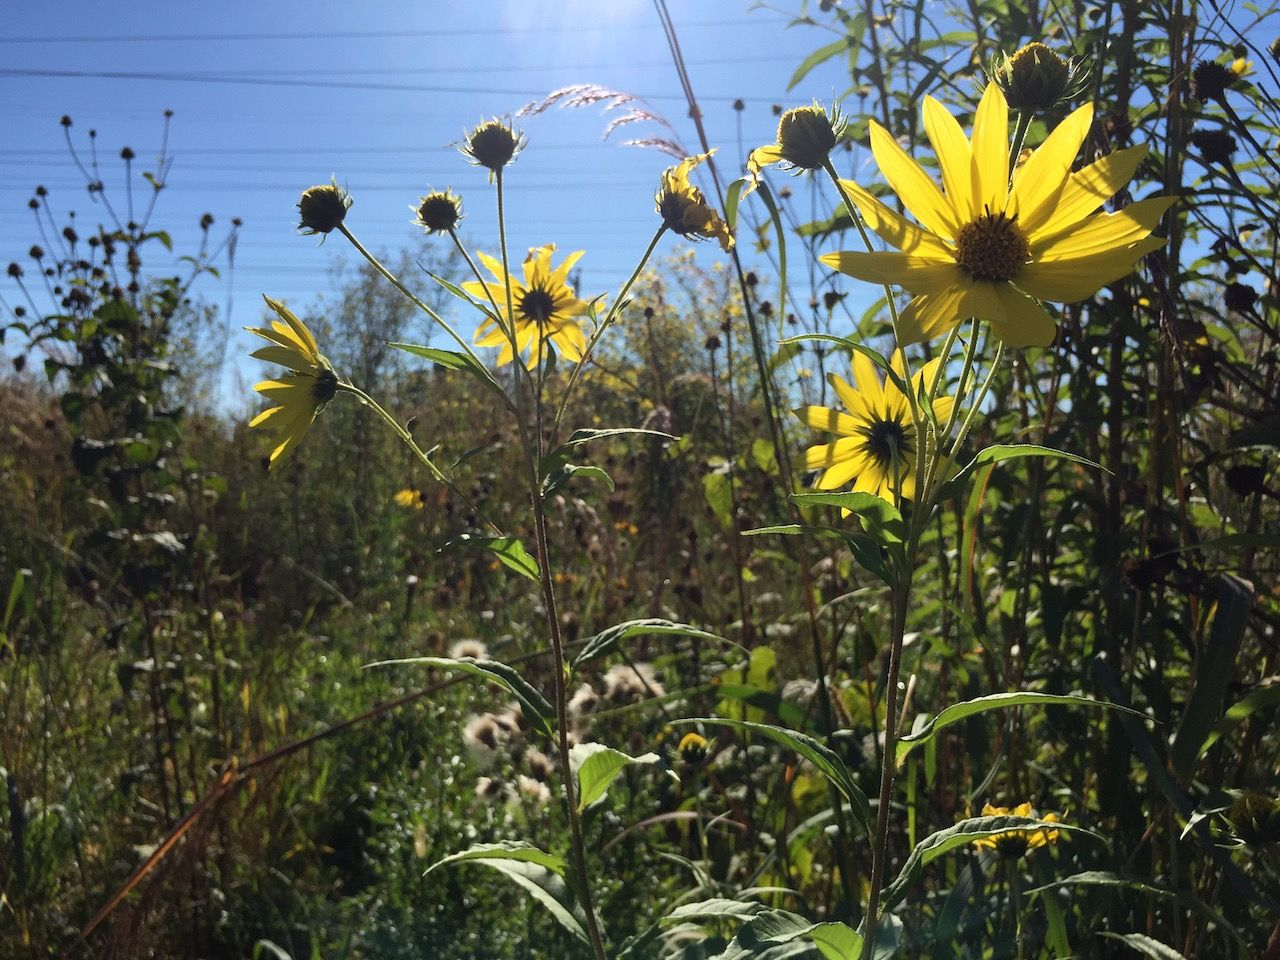 Naturalized meadow. Credit: Jake Tobin Garrett